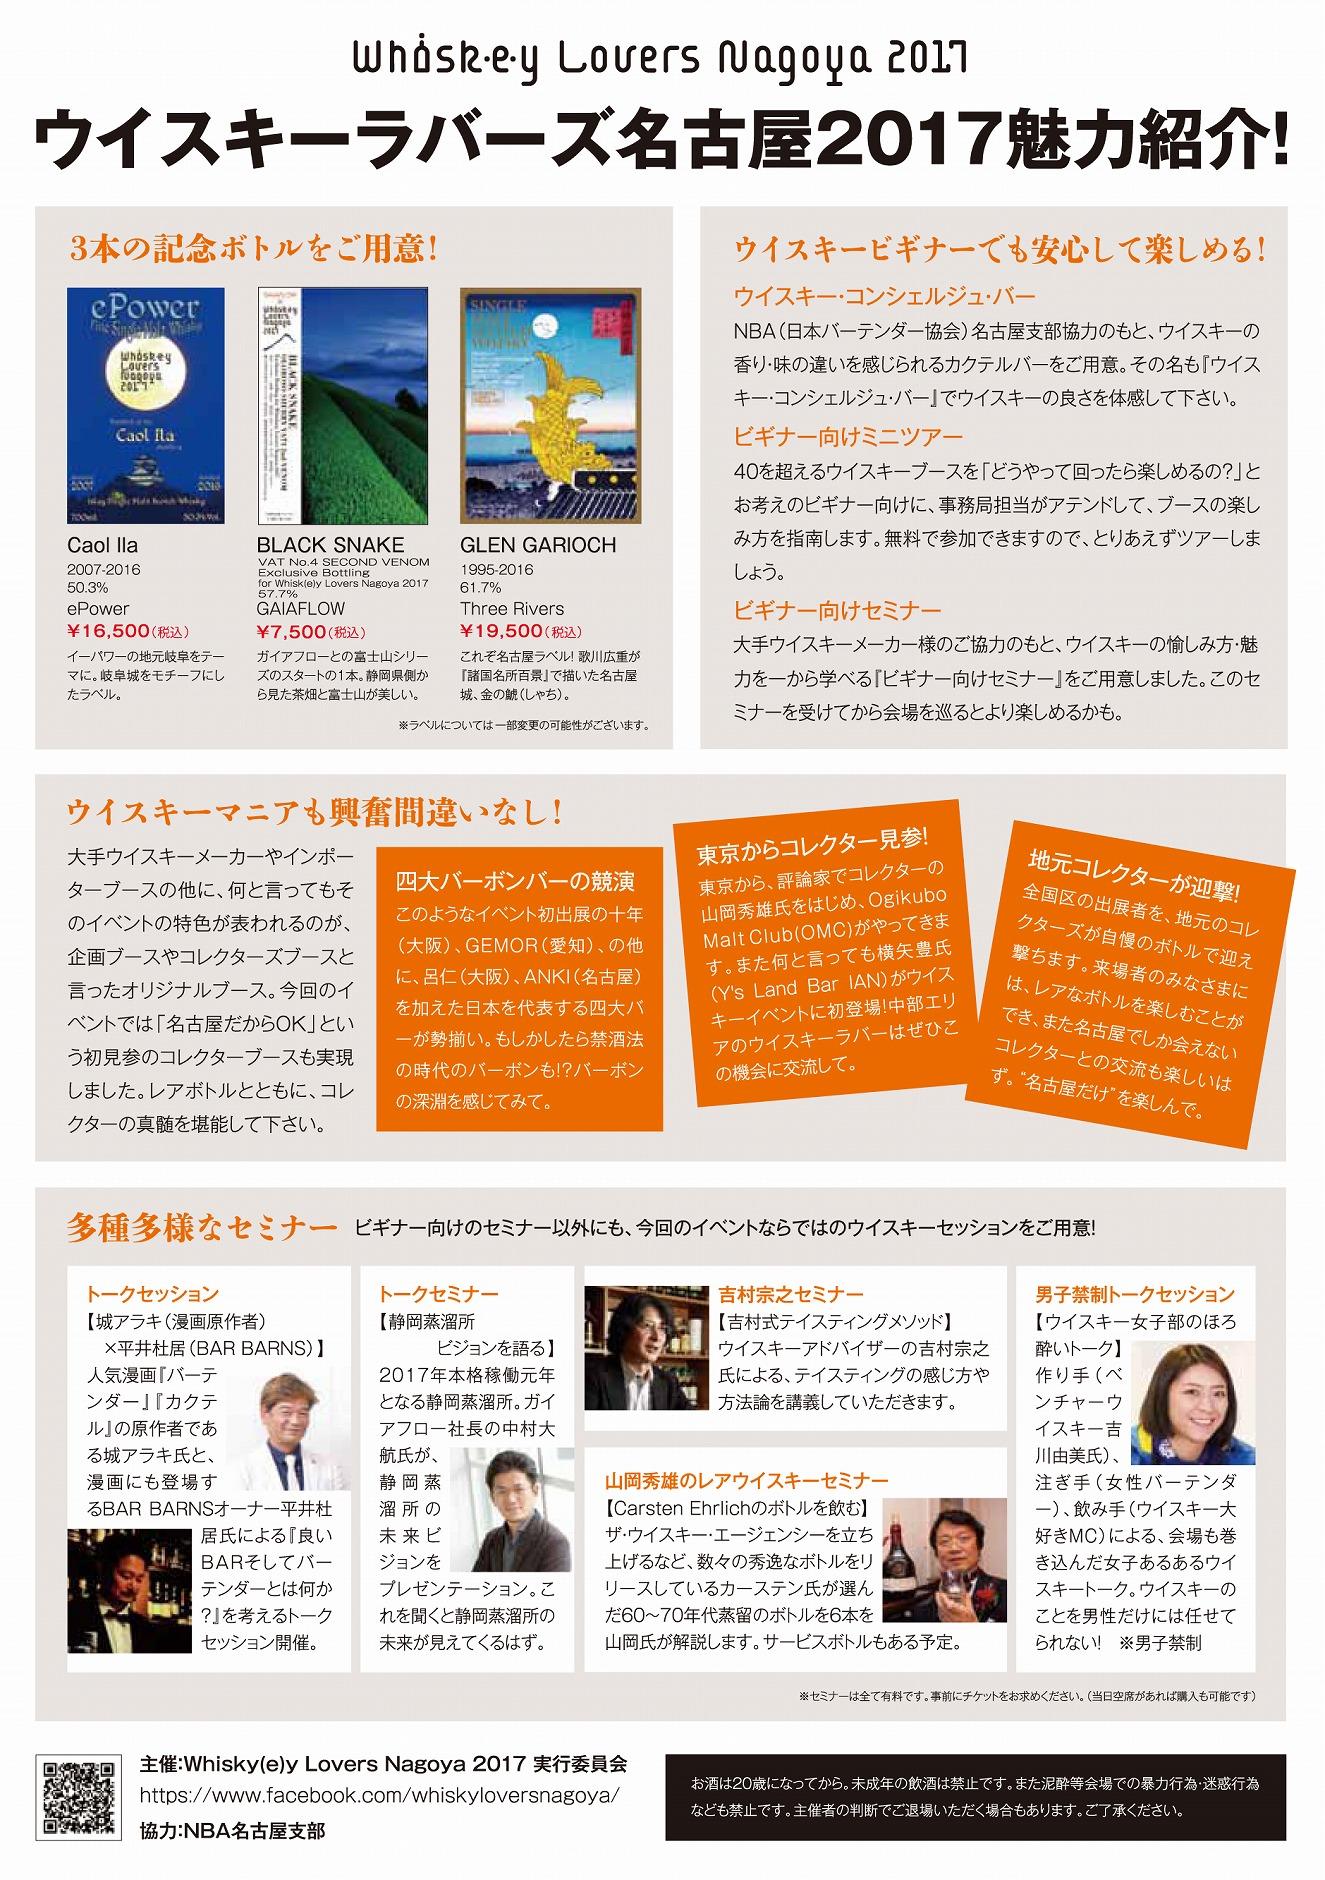 Whisk(e)y Lovers Nagoya 2017(ウイスキーラバーズ名古屋2017)に出展します!